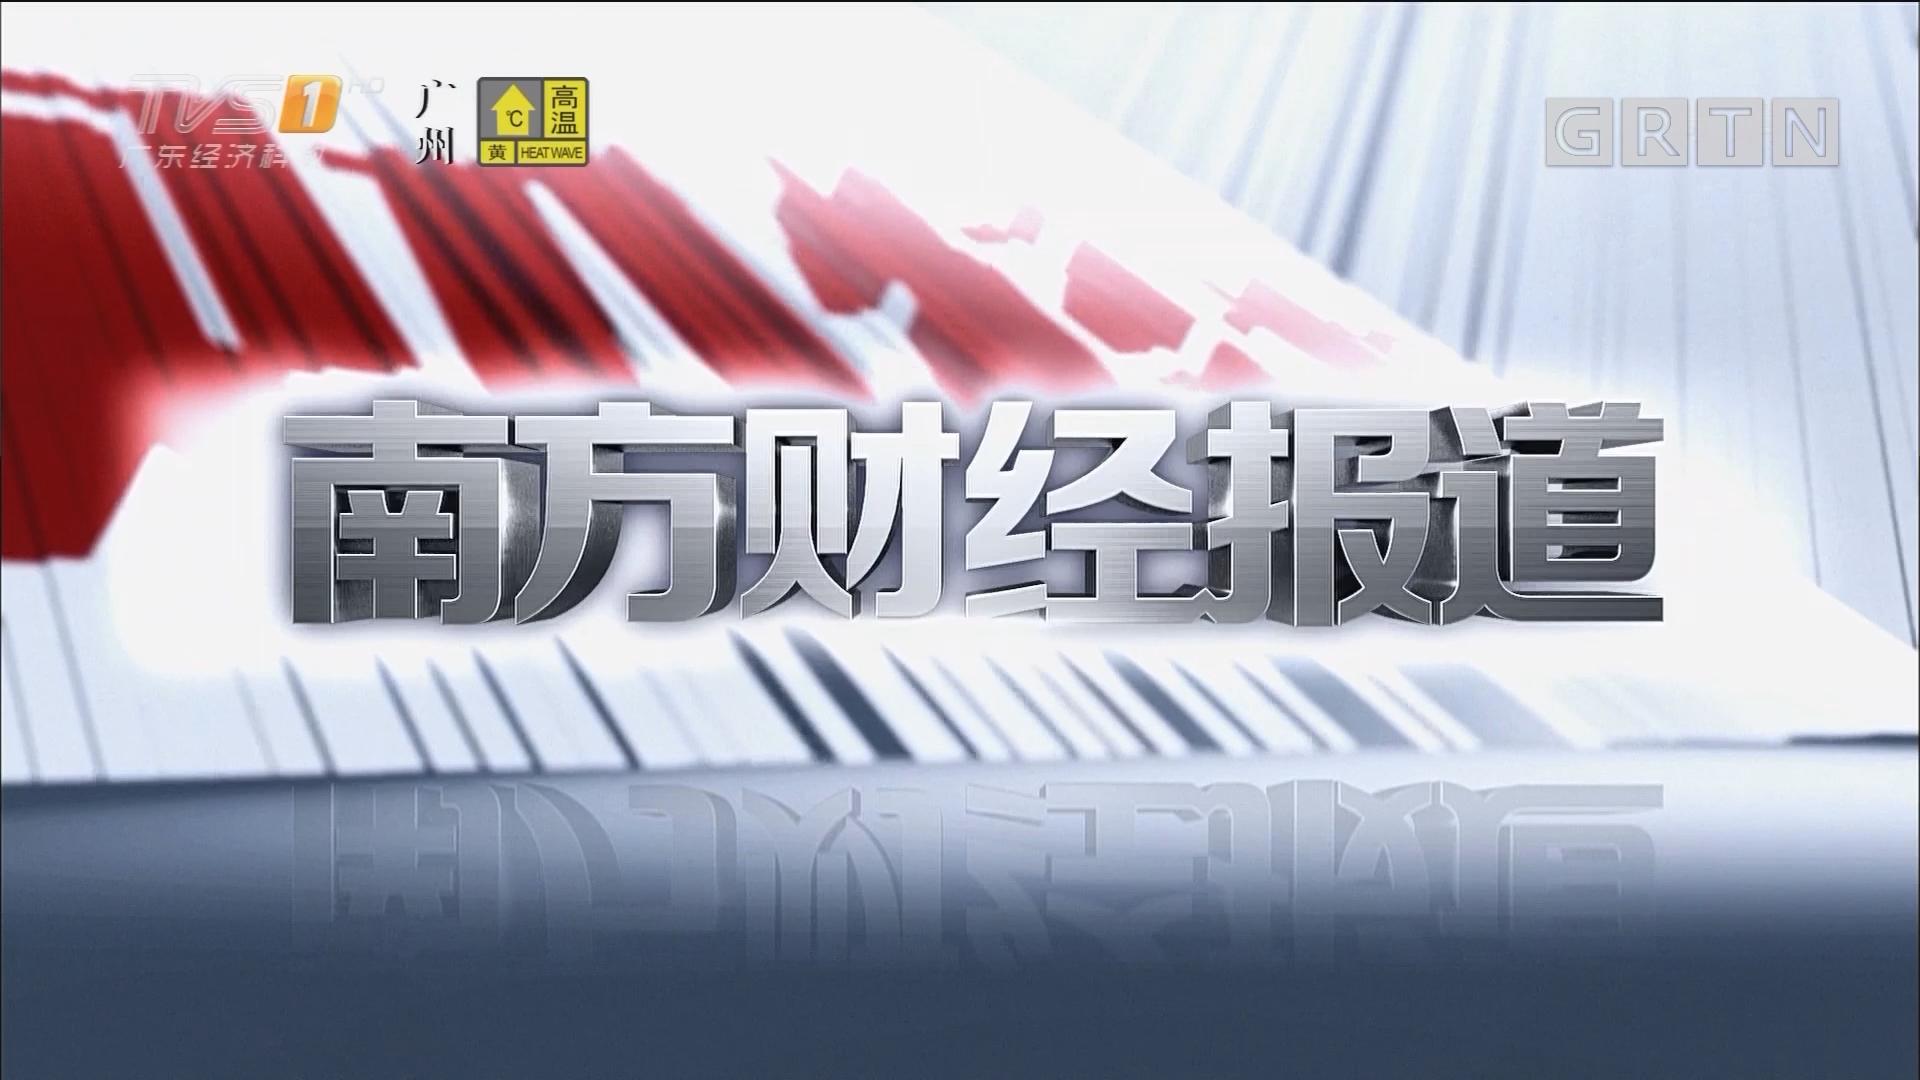 [HD][2018-09-21]南方财经报道:中国(广东)国际传播论坛:传播海丝精神 激发创新活力